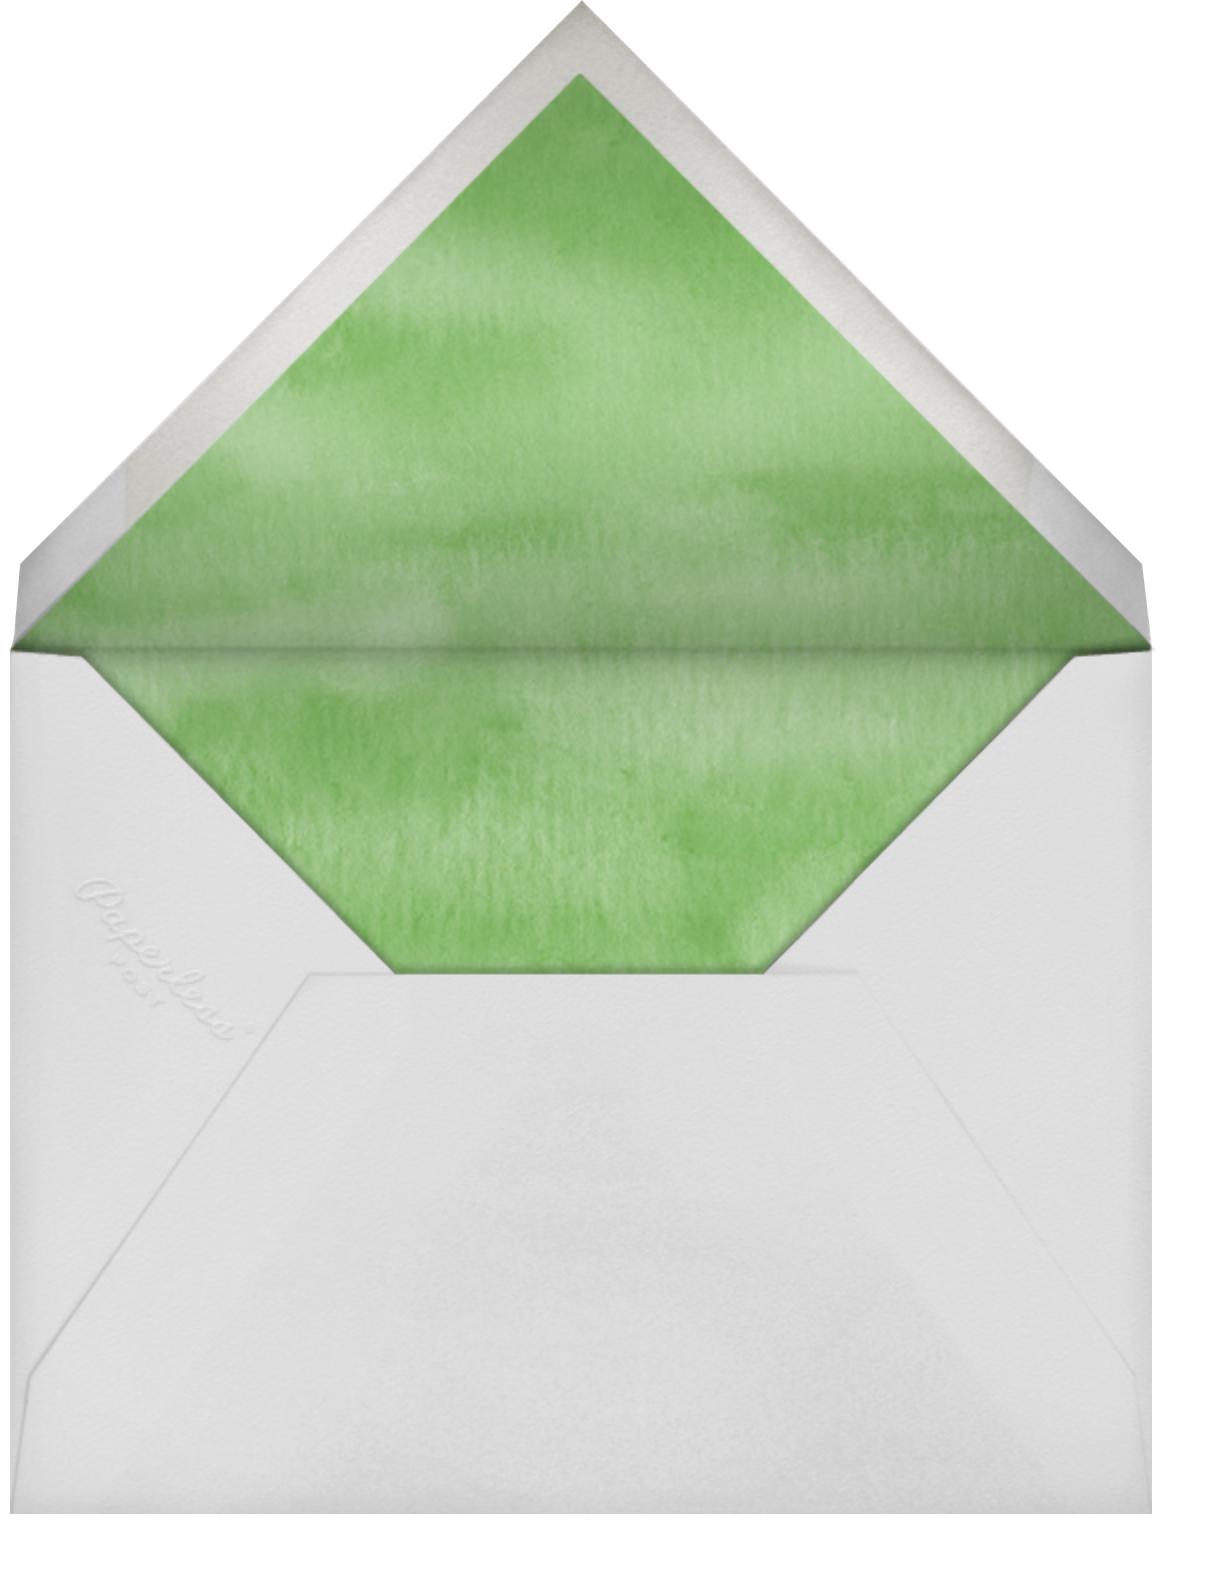 Naiad - Felix Doolittle - General entertaining - envelope back